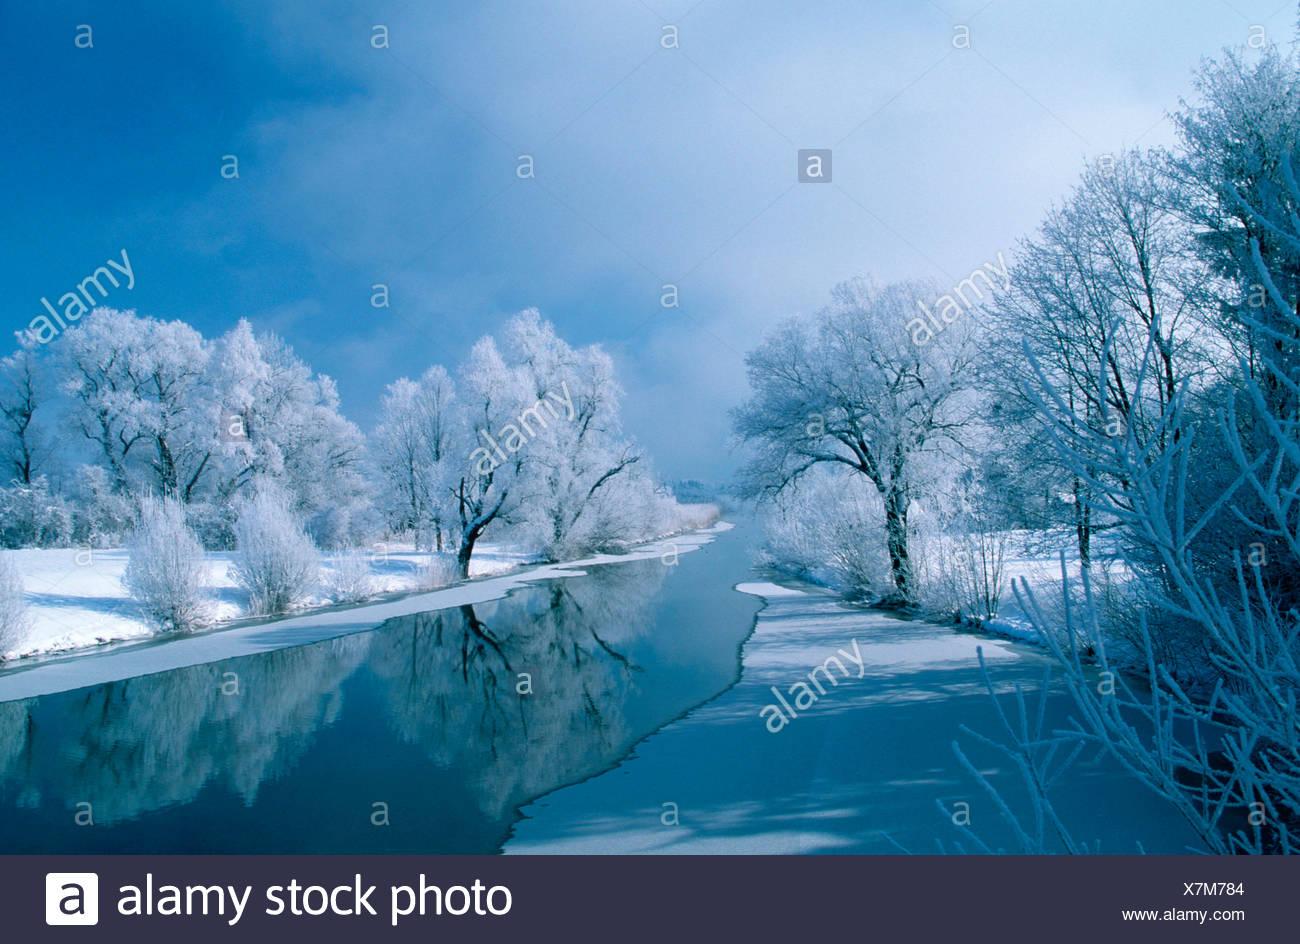 River Loisach / Fluss Loisach - Stock Image